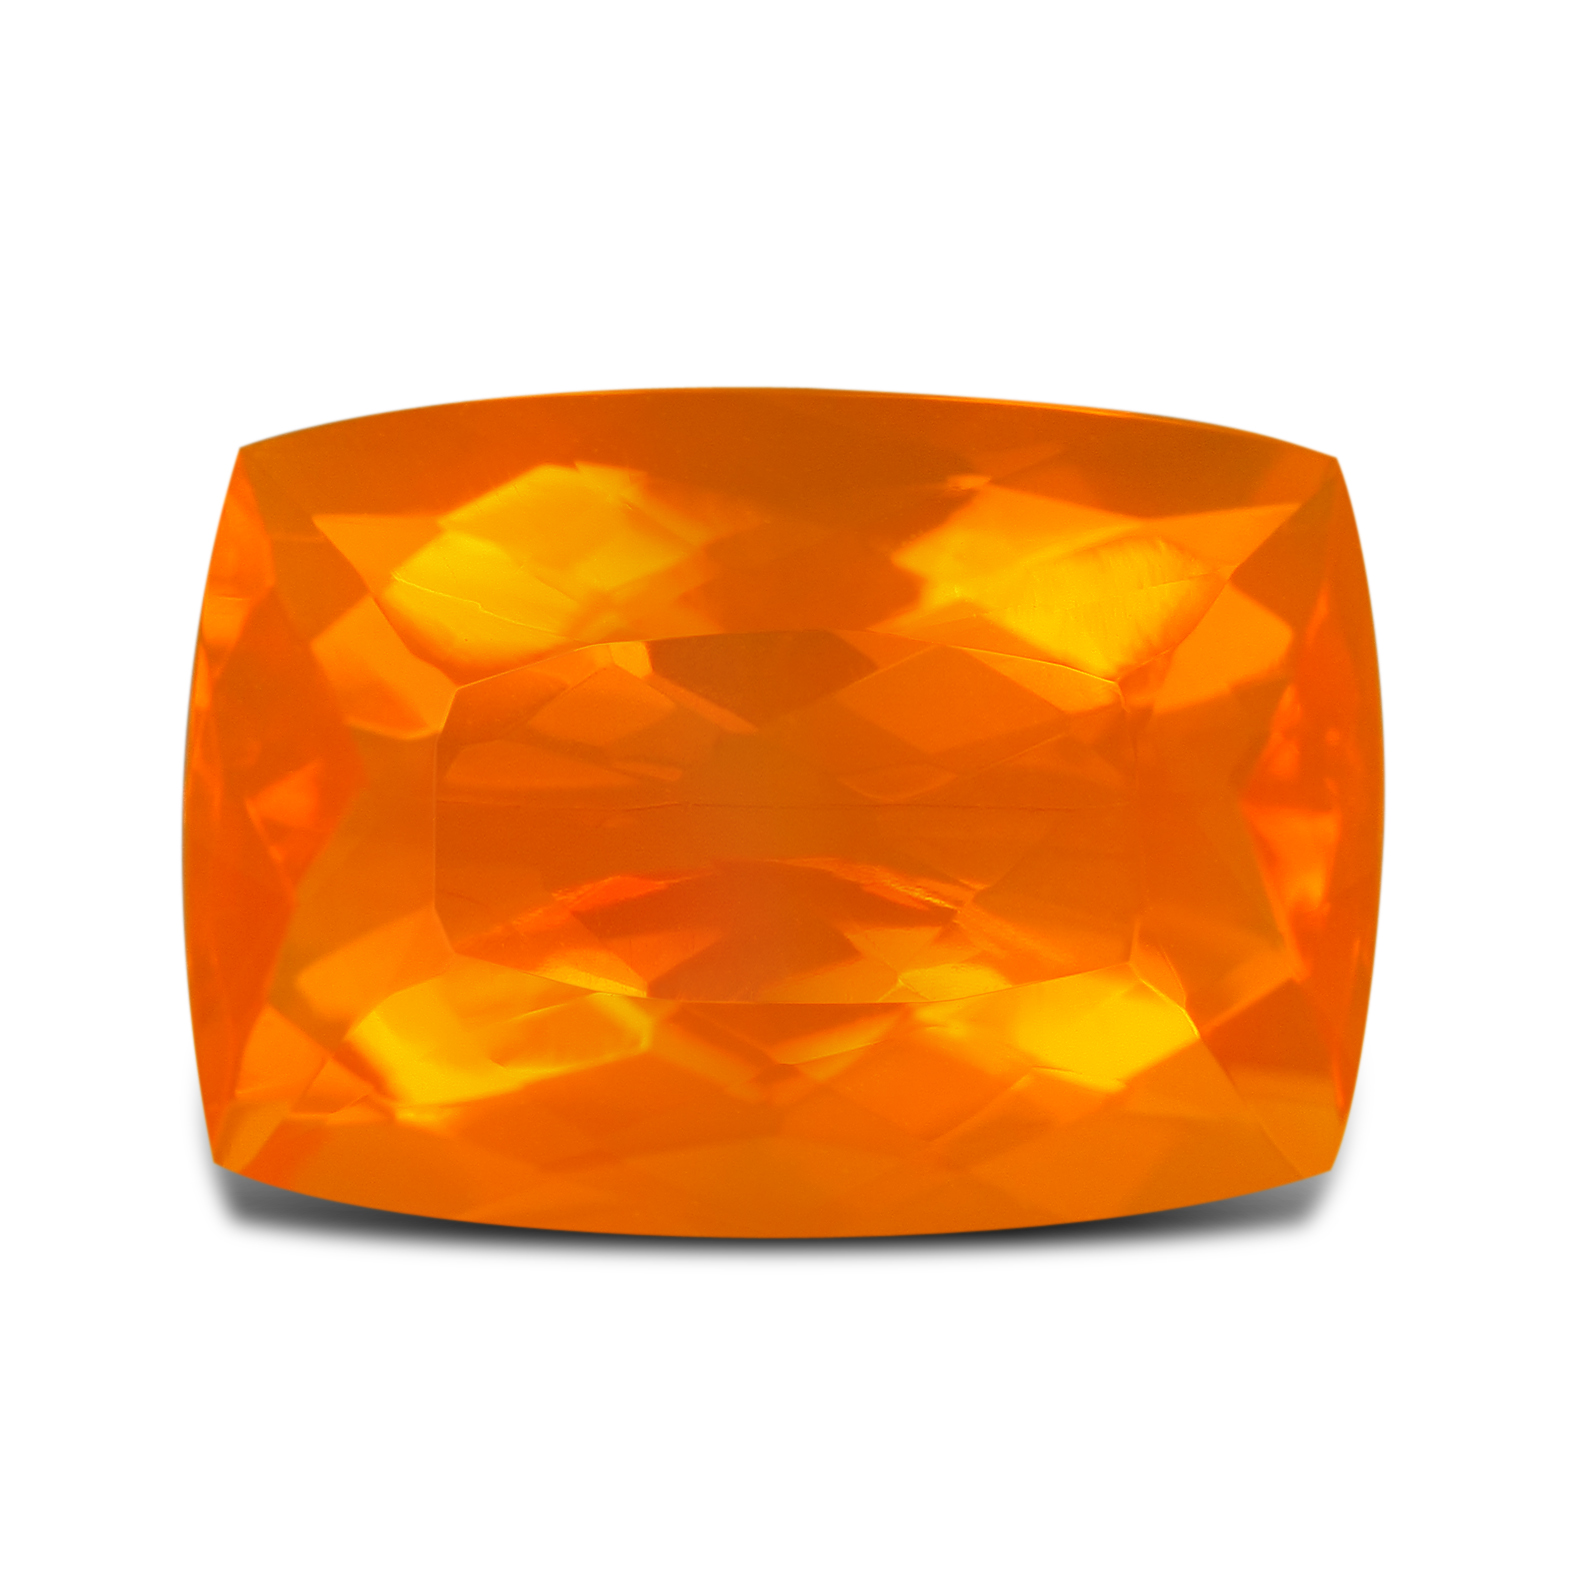 Newyorkgemstones Providing Beautiful Genuine Gemstone